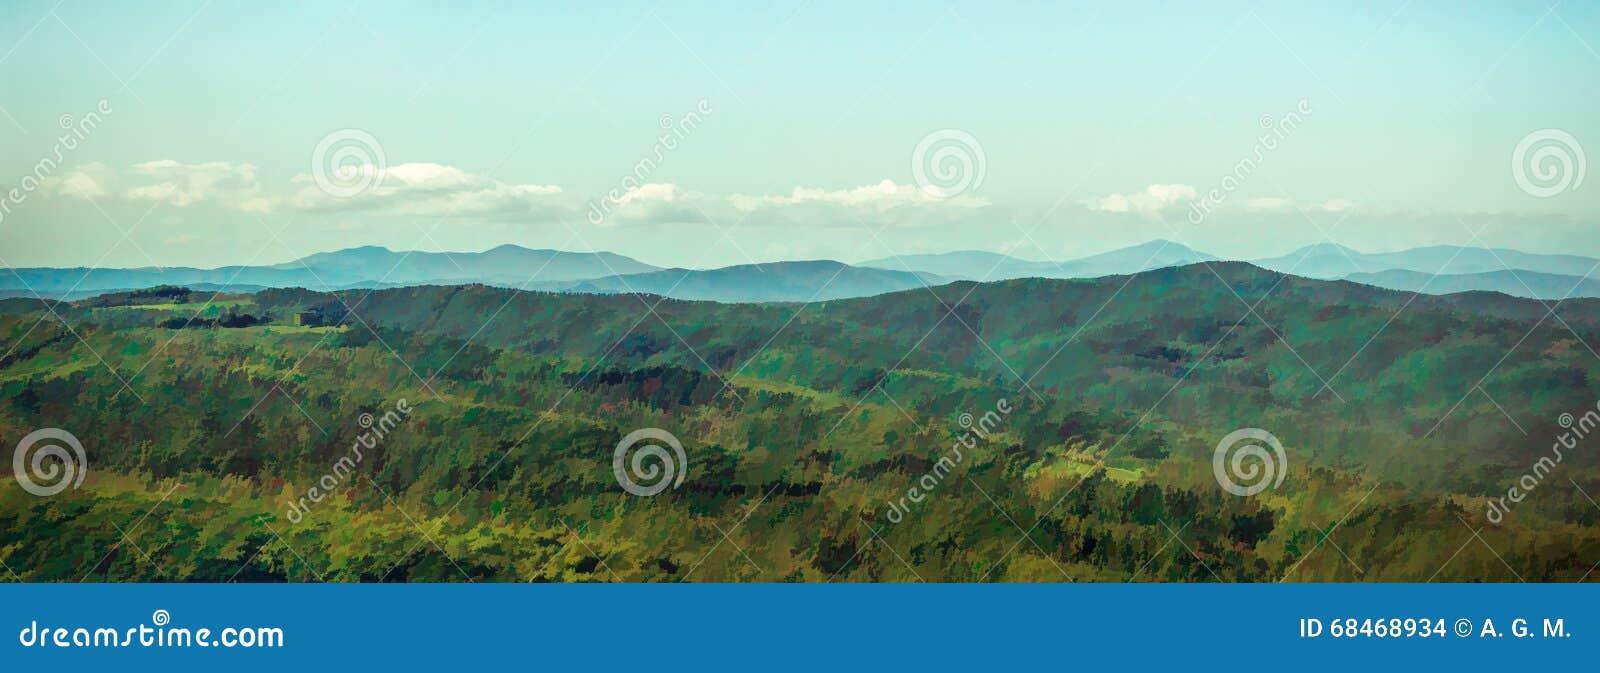 Landschaftspanoramablick eines toskanischen Tales